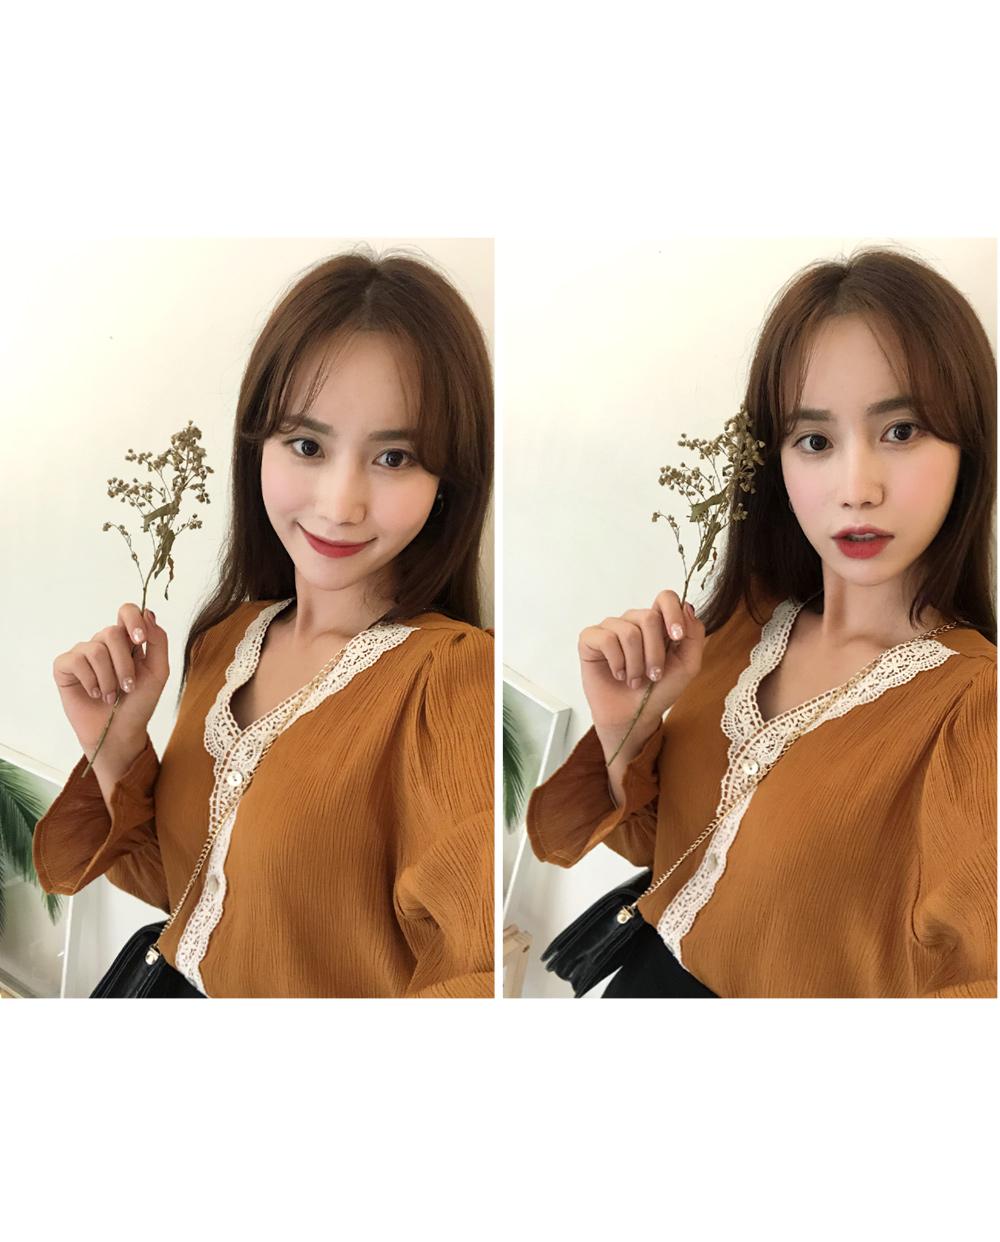 Blush lace blouse